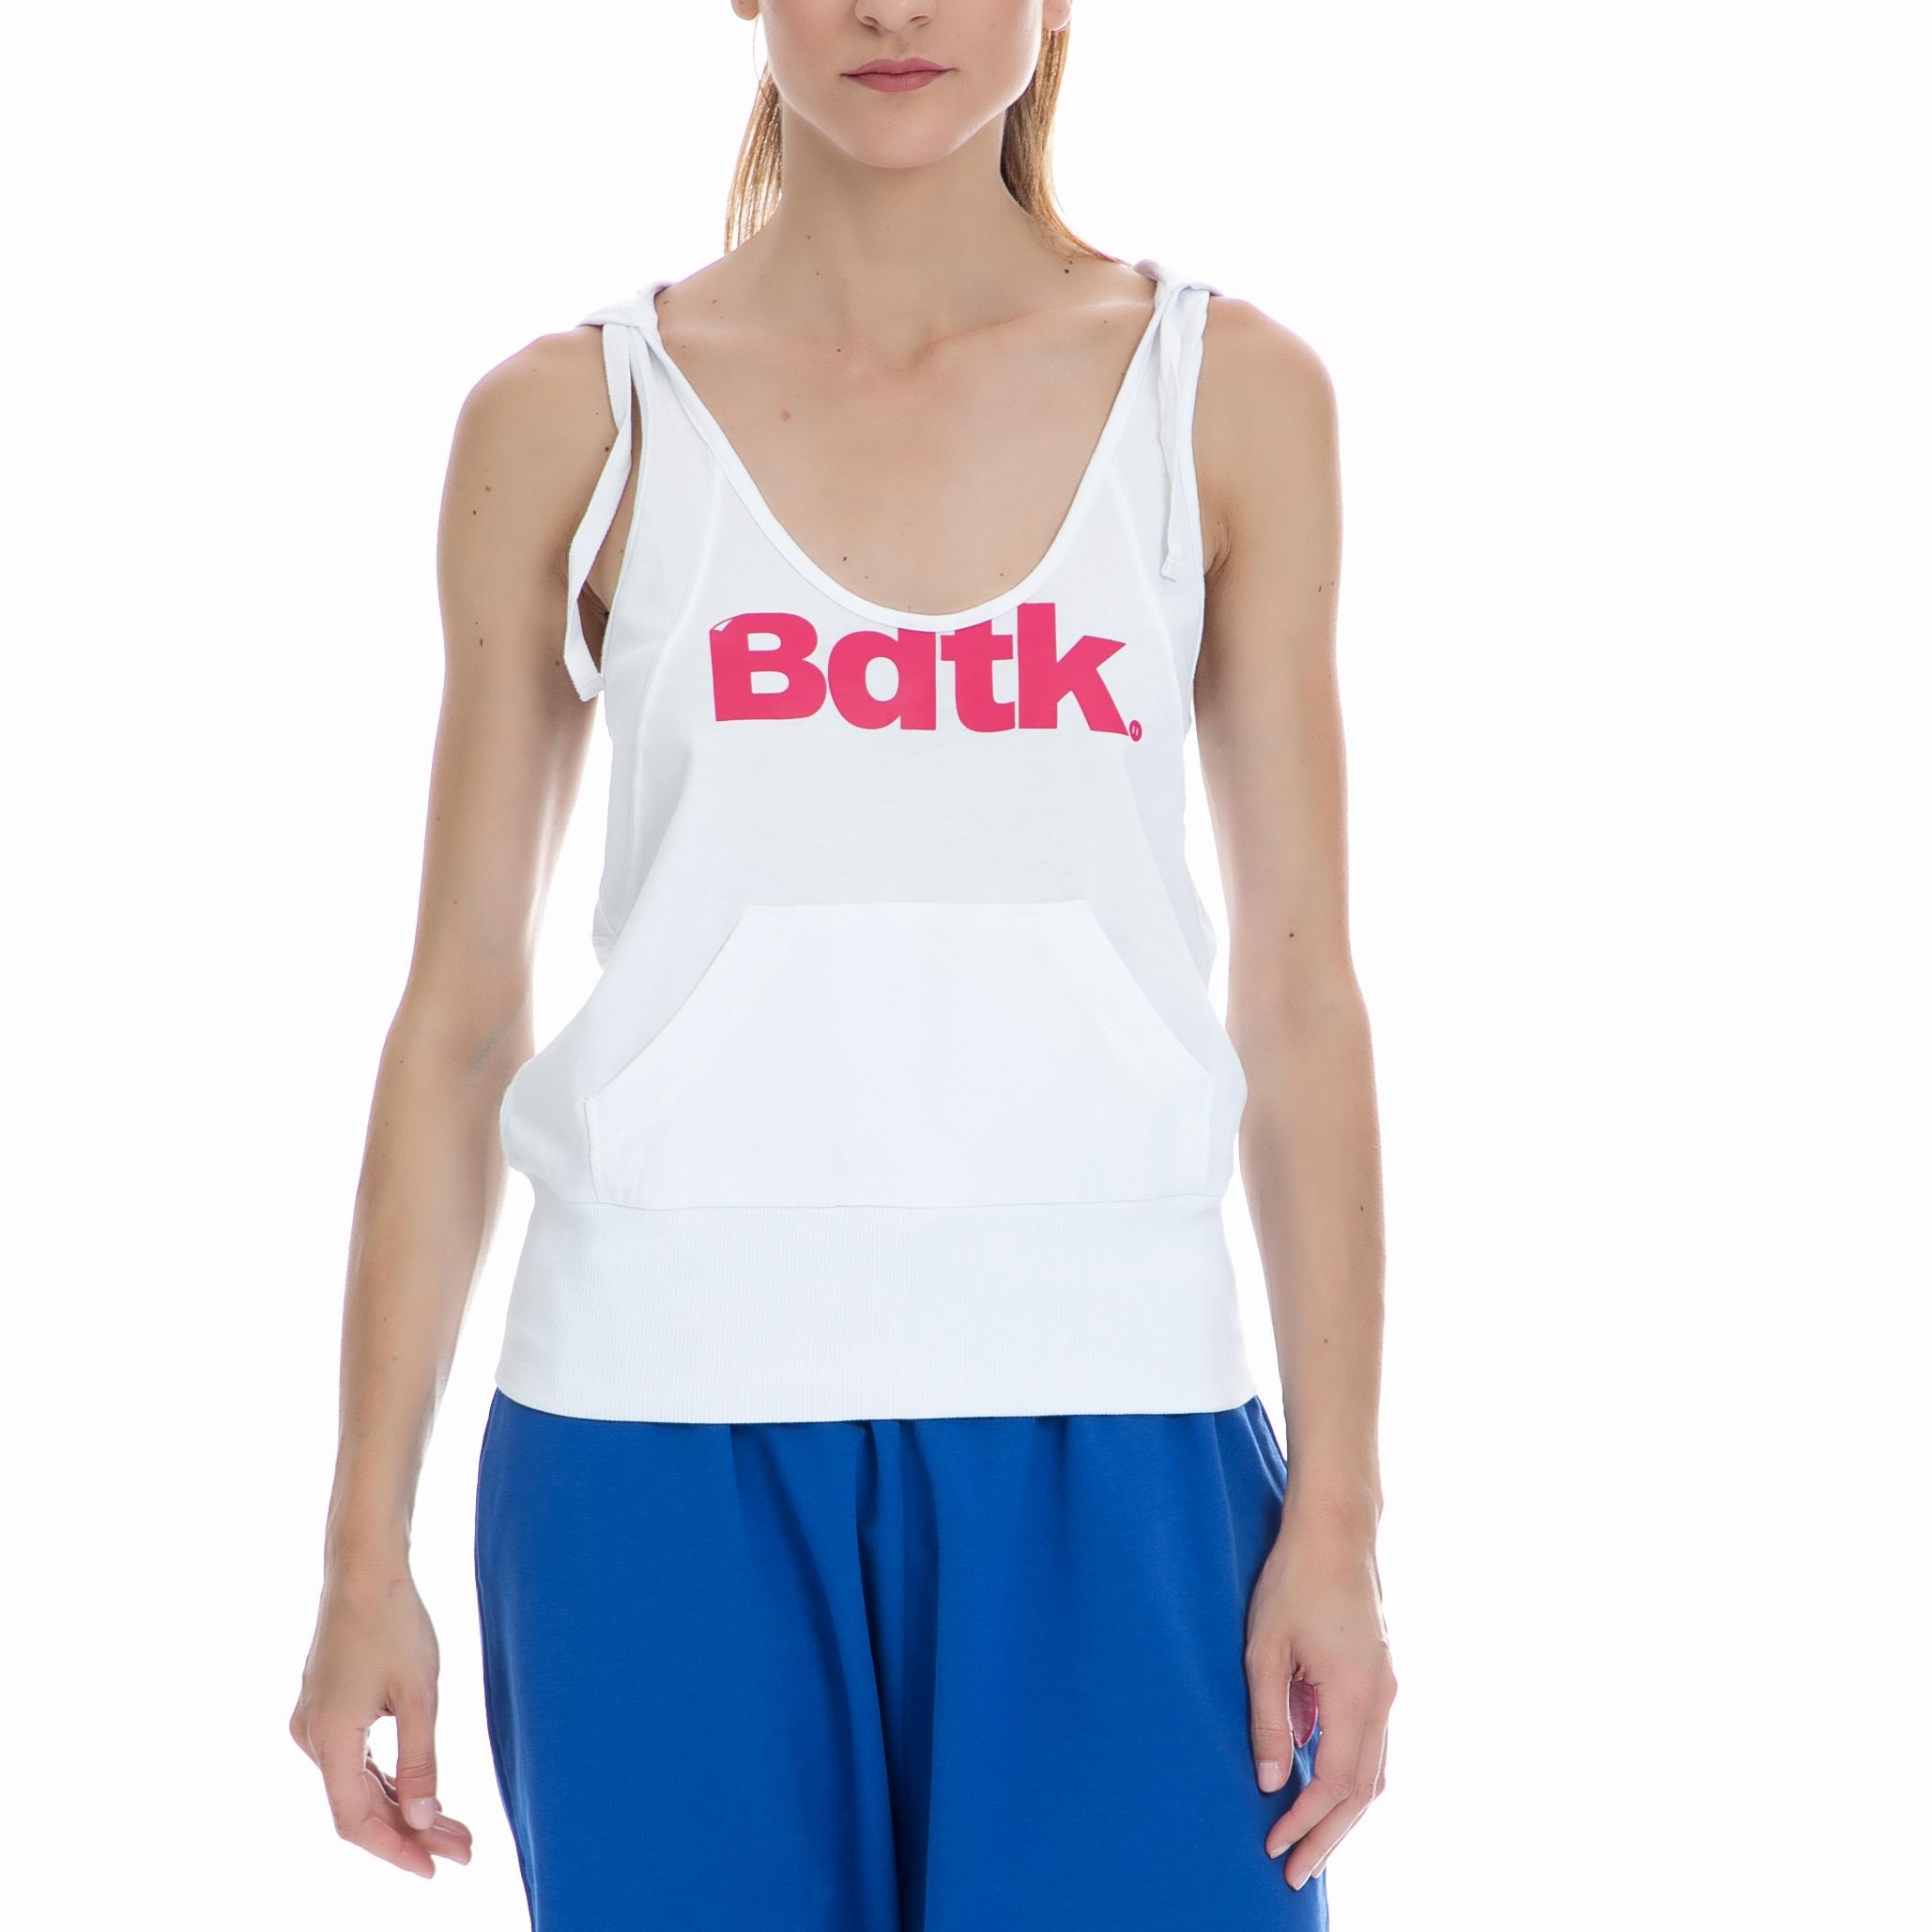 BODYTALK - Γυναικεία μπλούζα BODYTALK άσπρη γυναικεία ρούχα αθλητικά t shirt τοπ